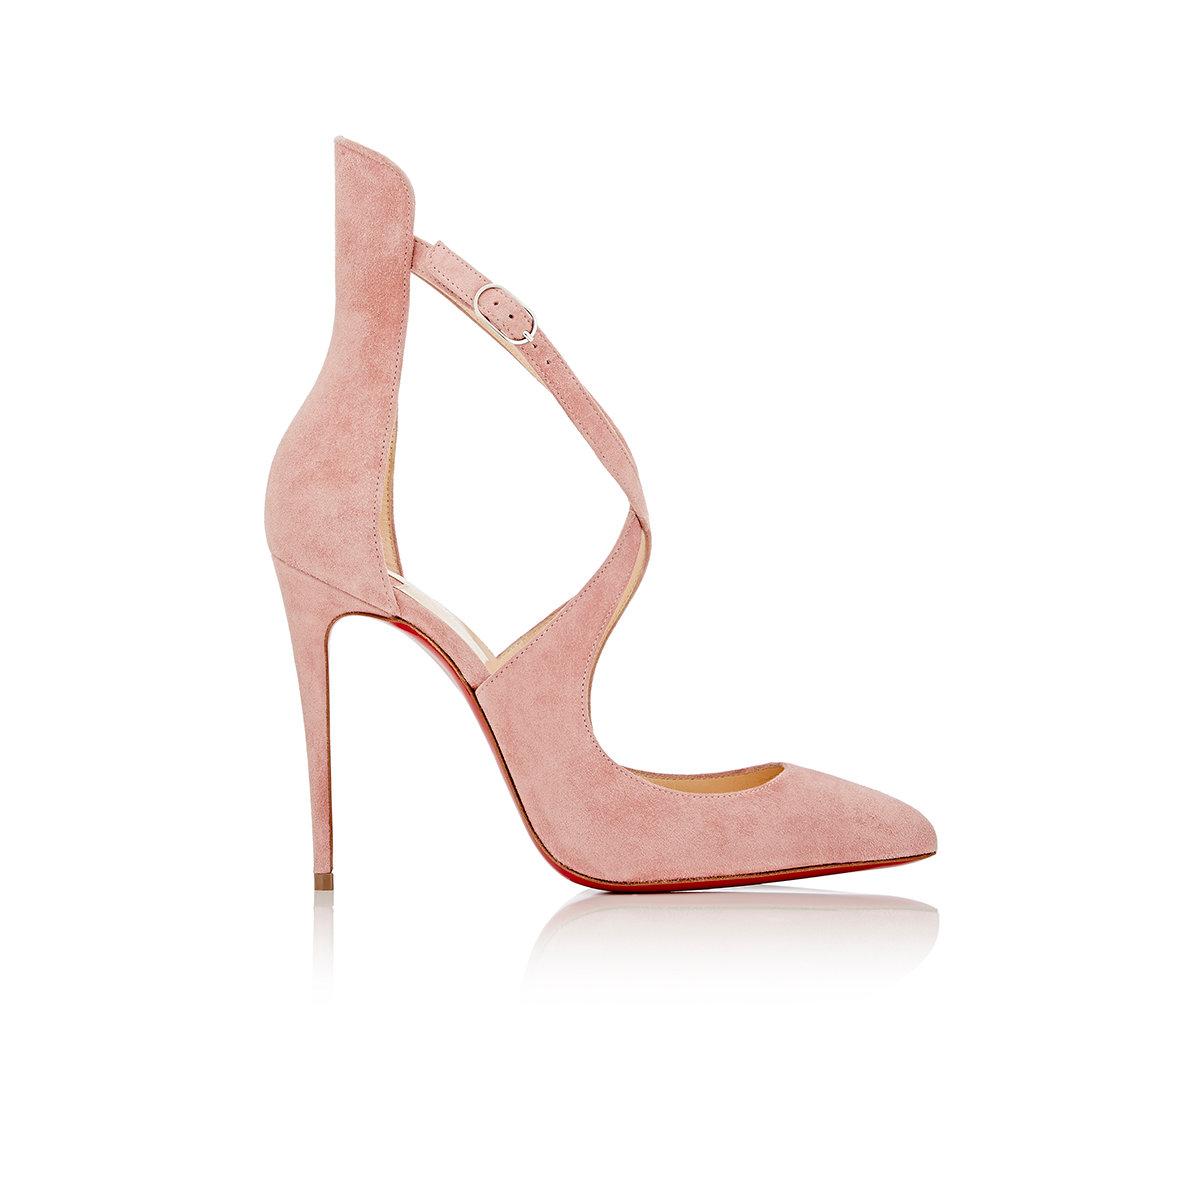 christian louboutin shoes replica - Christian louboutin Women's Marlenarock Pumps in Pink (Red) | Lyst